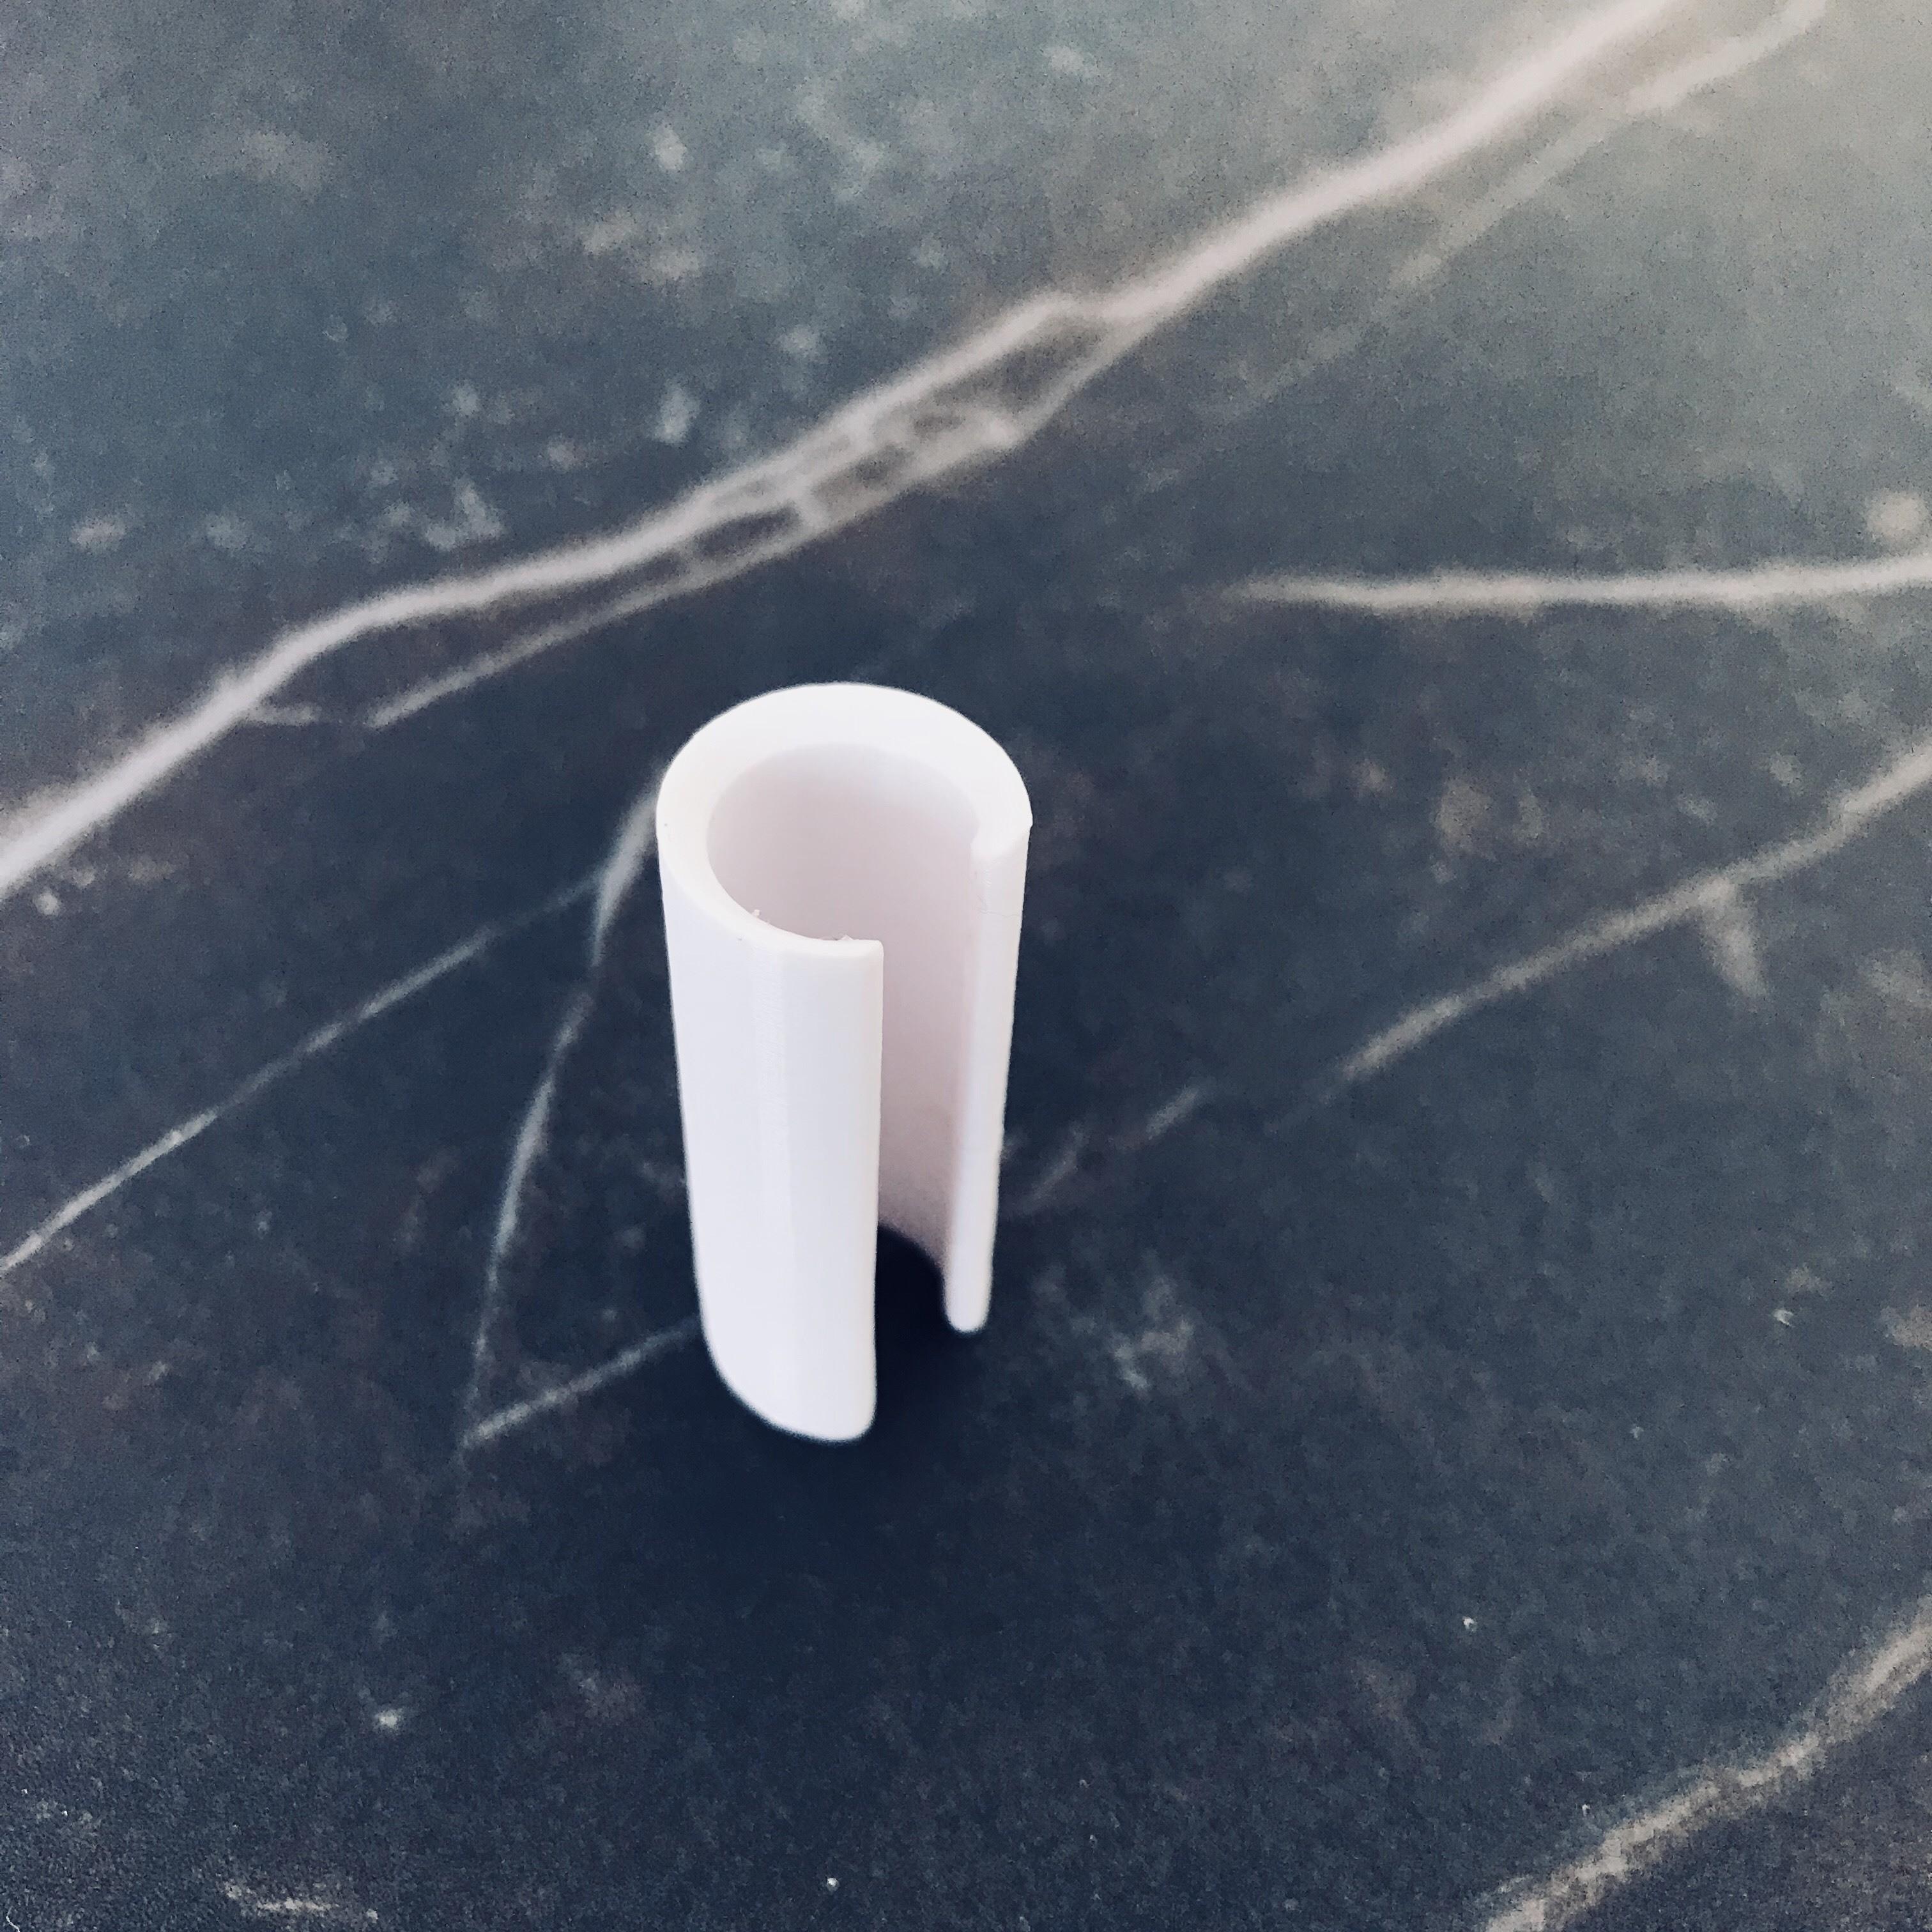 IMG_1336.jpg Download free STL file THE DOSETTE KEY • 3D printable object, JeremyBarbazaStudio